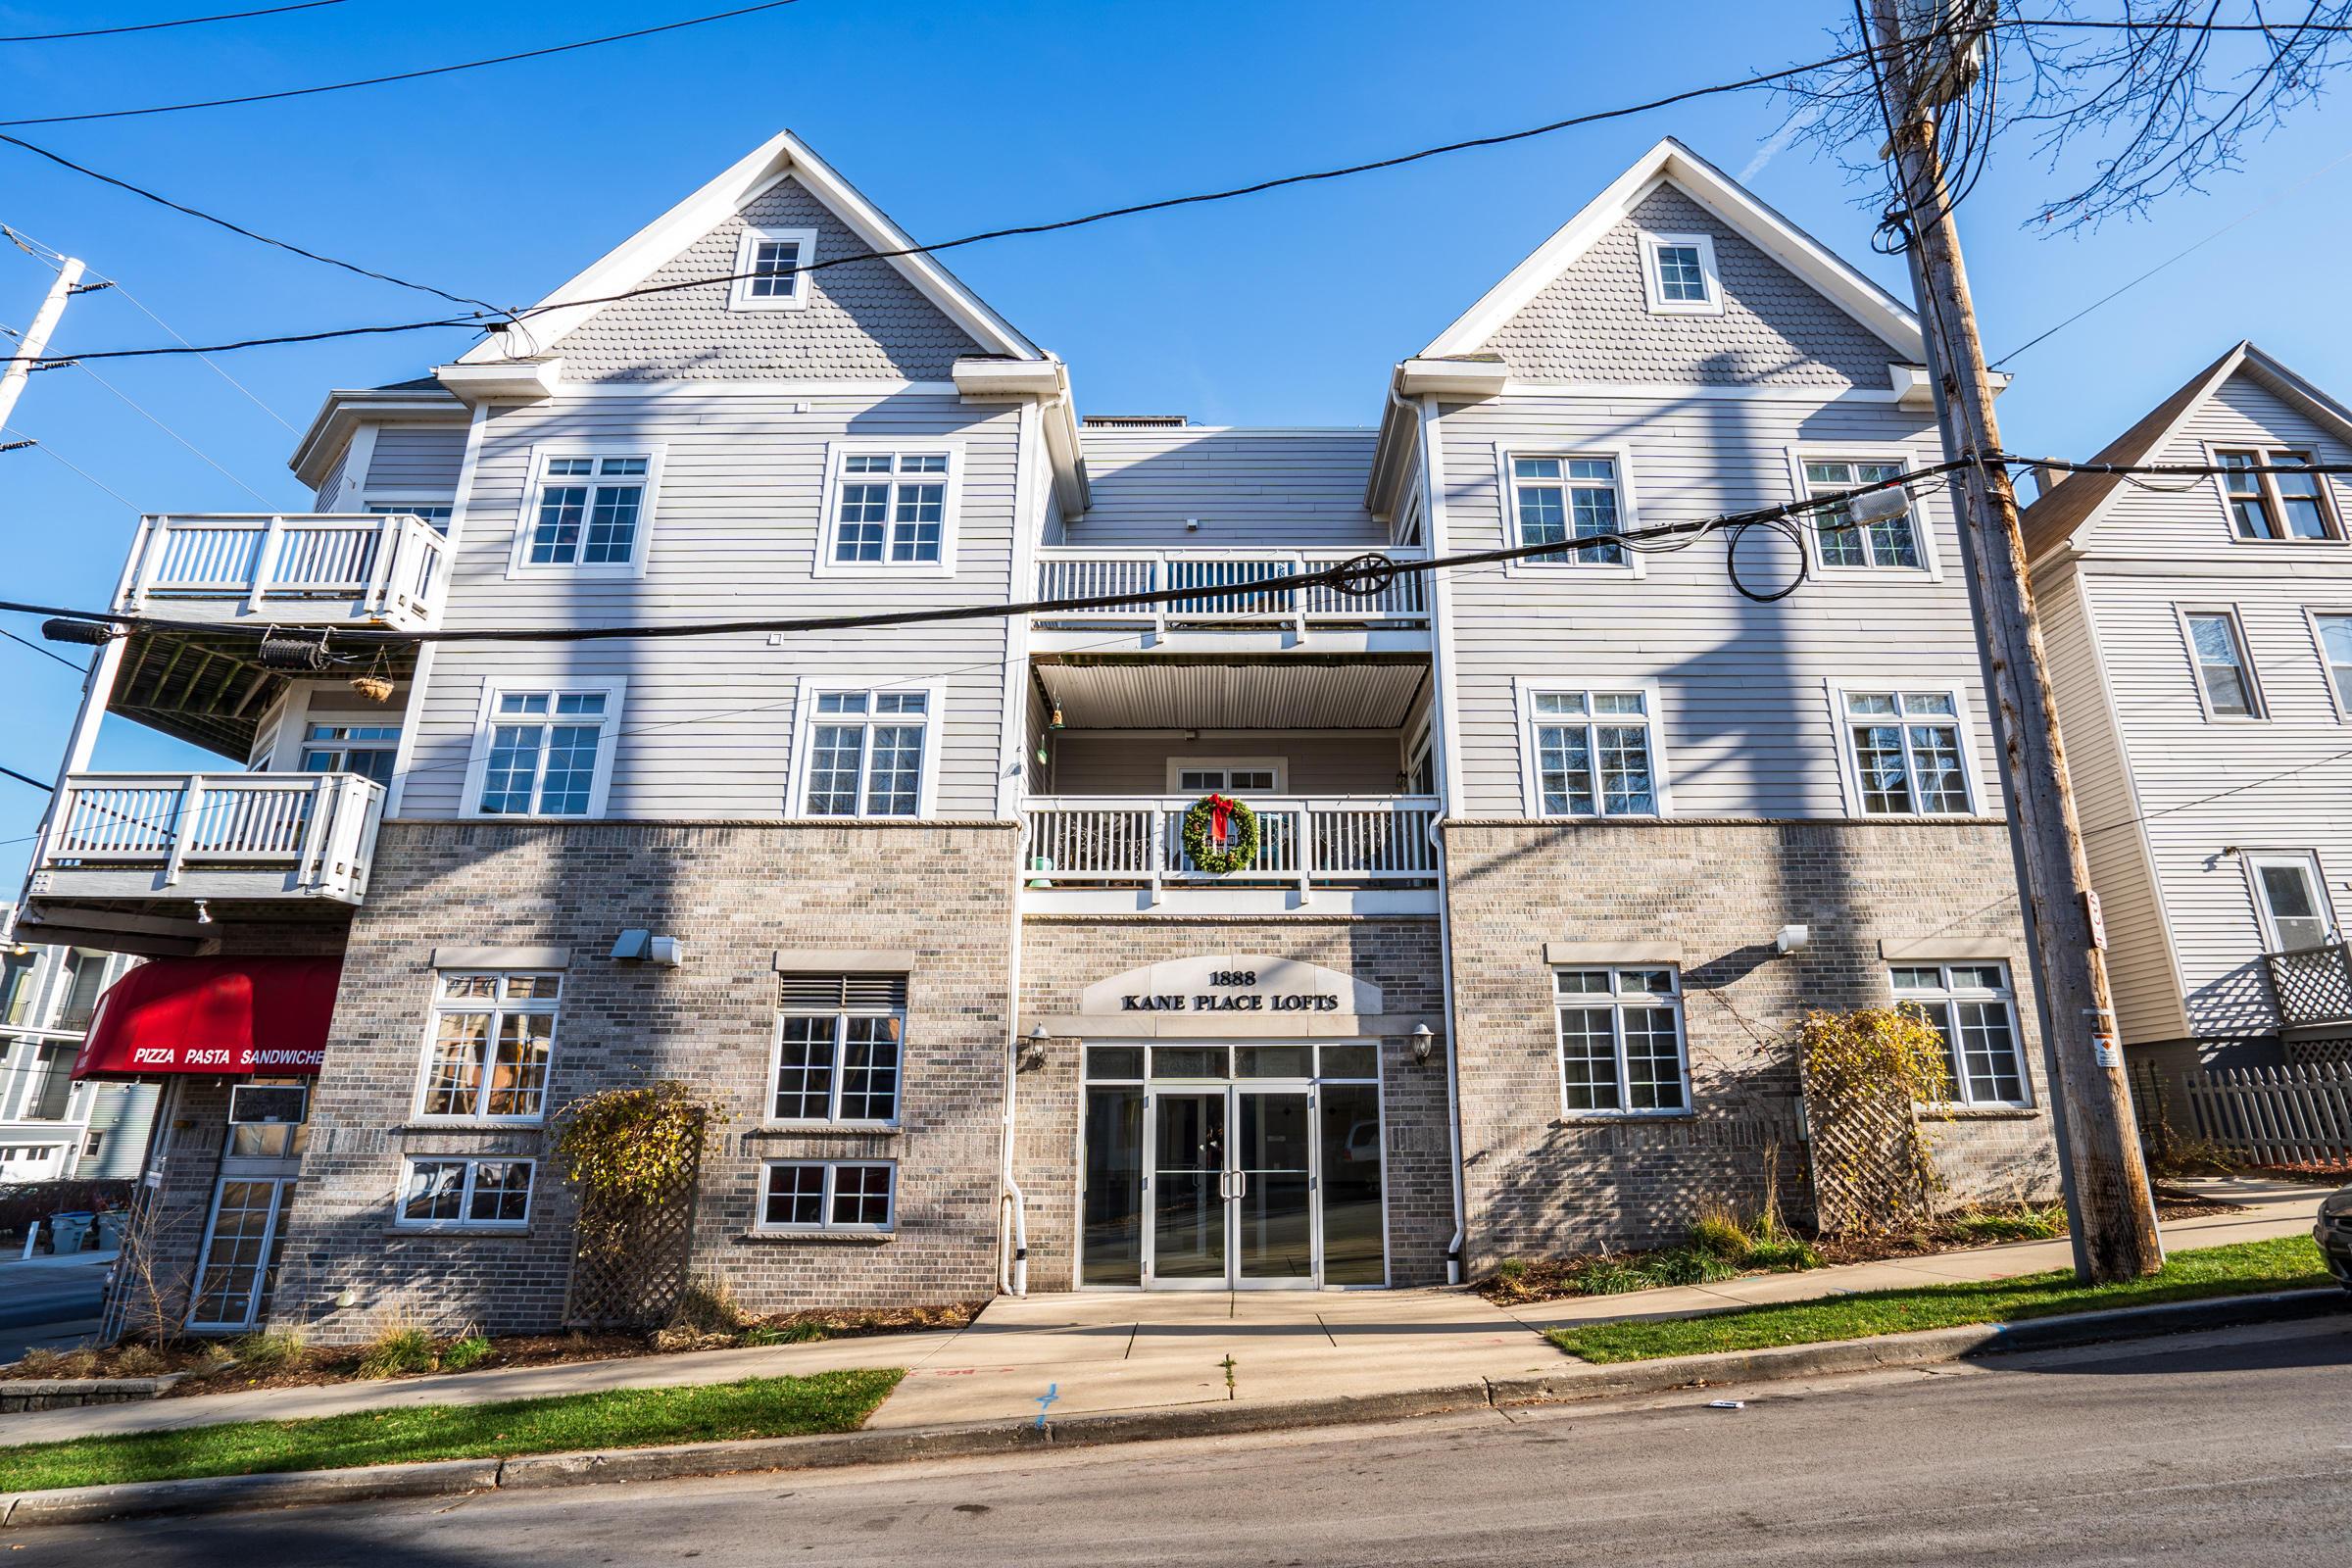 1888 Humboldt Ave, Milwaukee, Wisconsin 53202, 2 Bedrooms Bedrooms, 6 Rooms Rooms,2 BathroomsBathrooms,Condominium,For Sale,Humboldt Ave,1721359